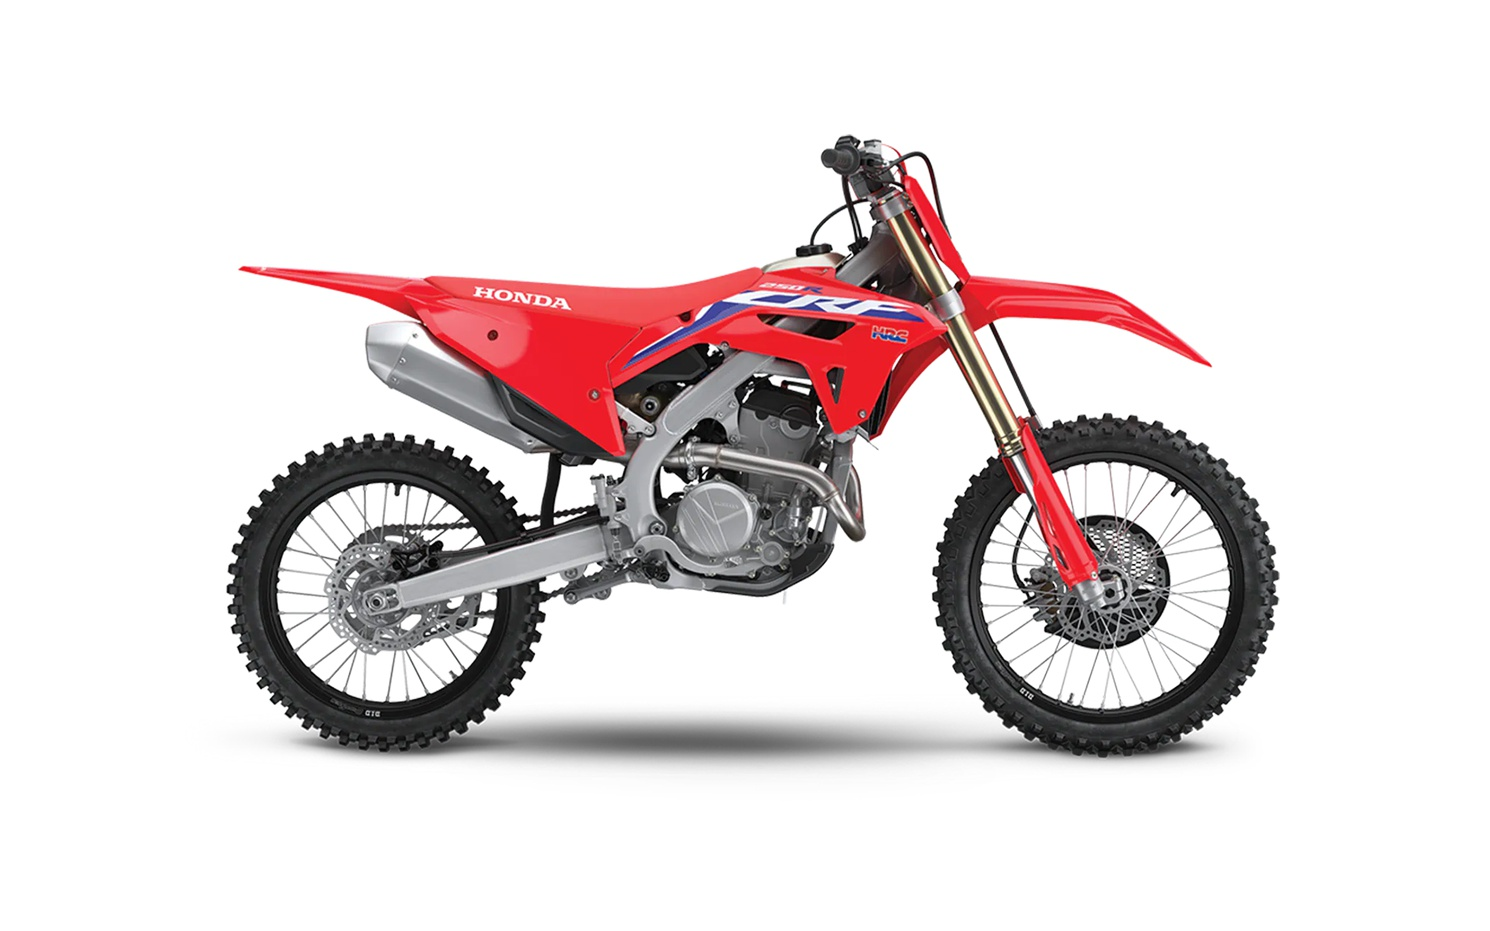 2022 Honda CRF250R Frais inclus+Taxes